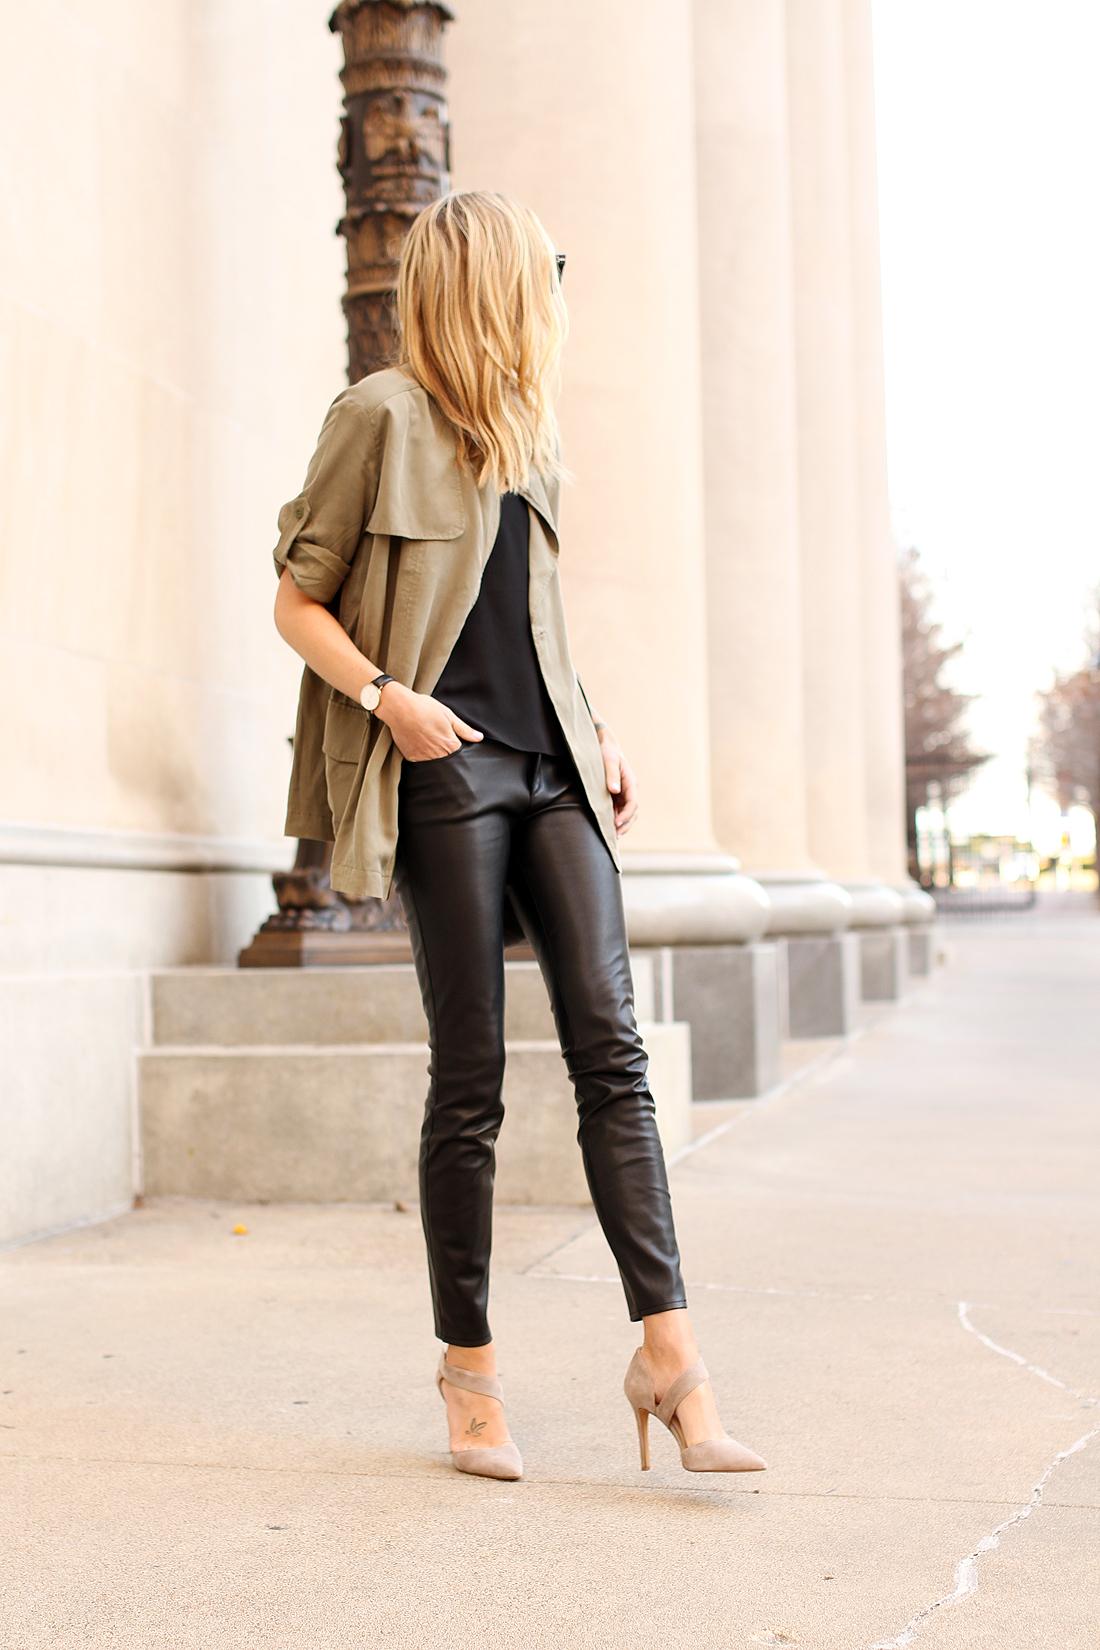 fashion-jackson-banana-republic-drapey-drawstring-jacket-black-faux-leather-pants-vince-camuto-carlotte-pumps-daniel-wellington-watch